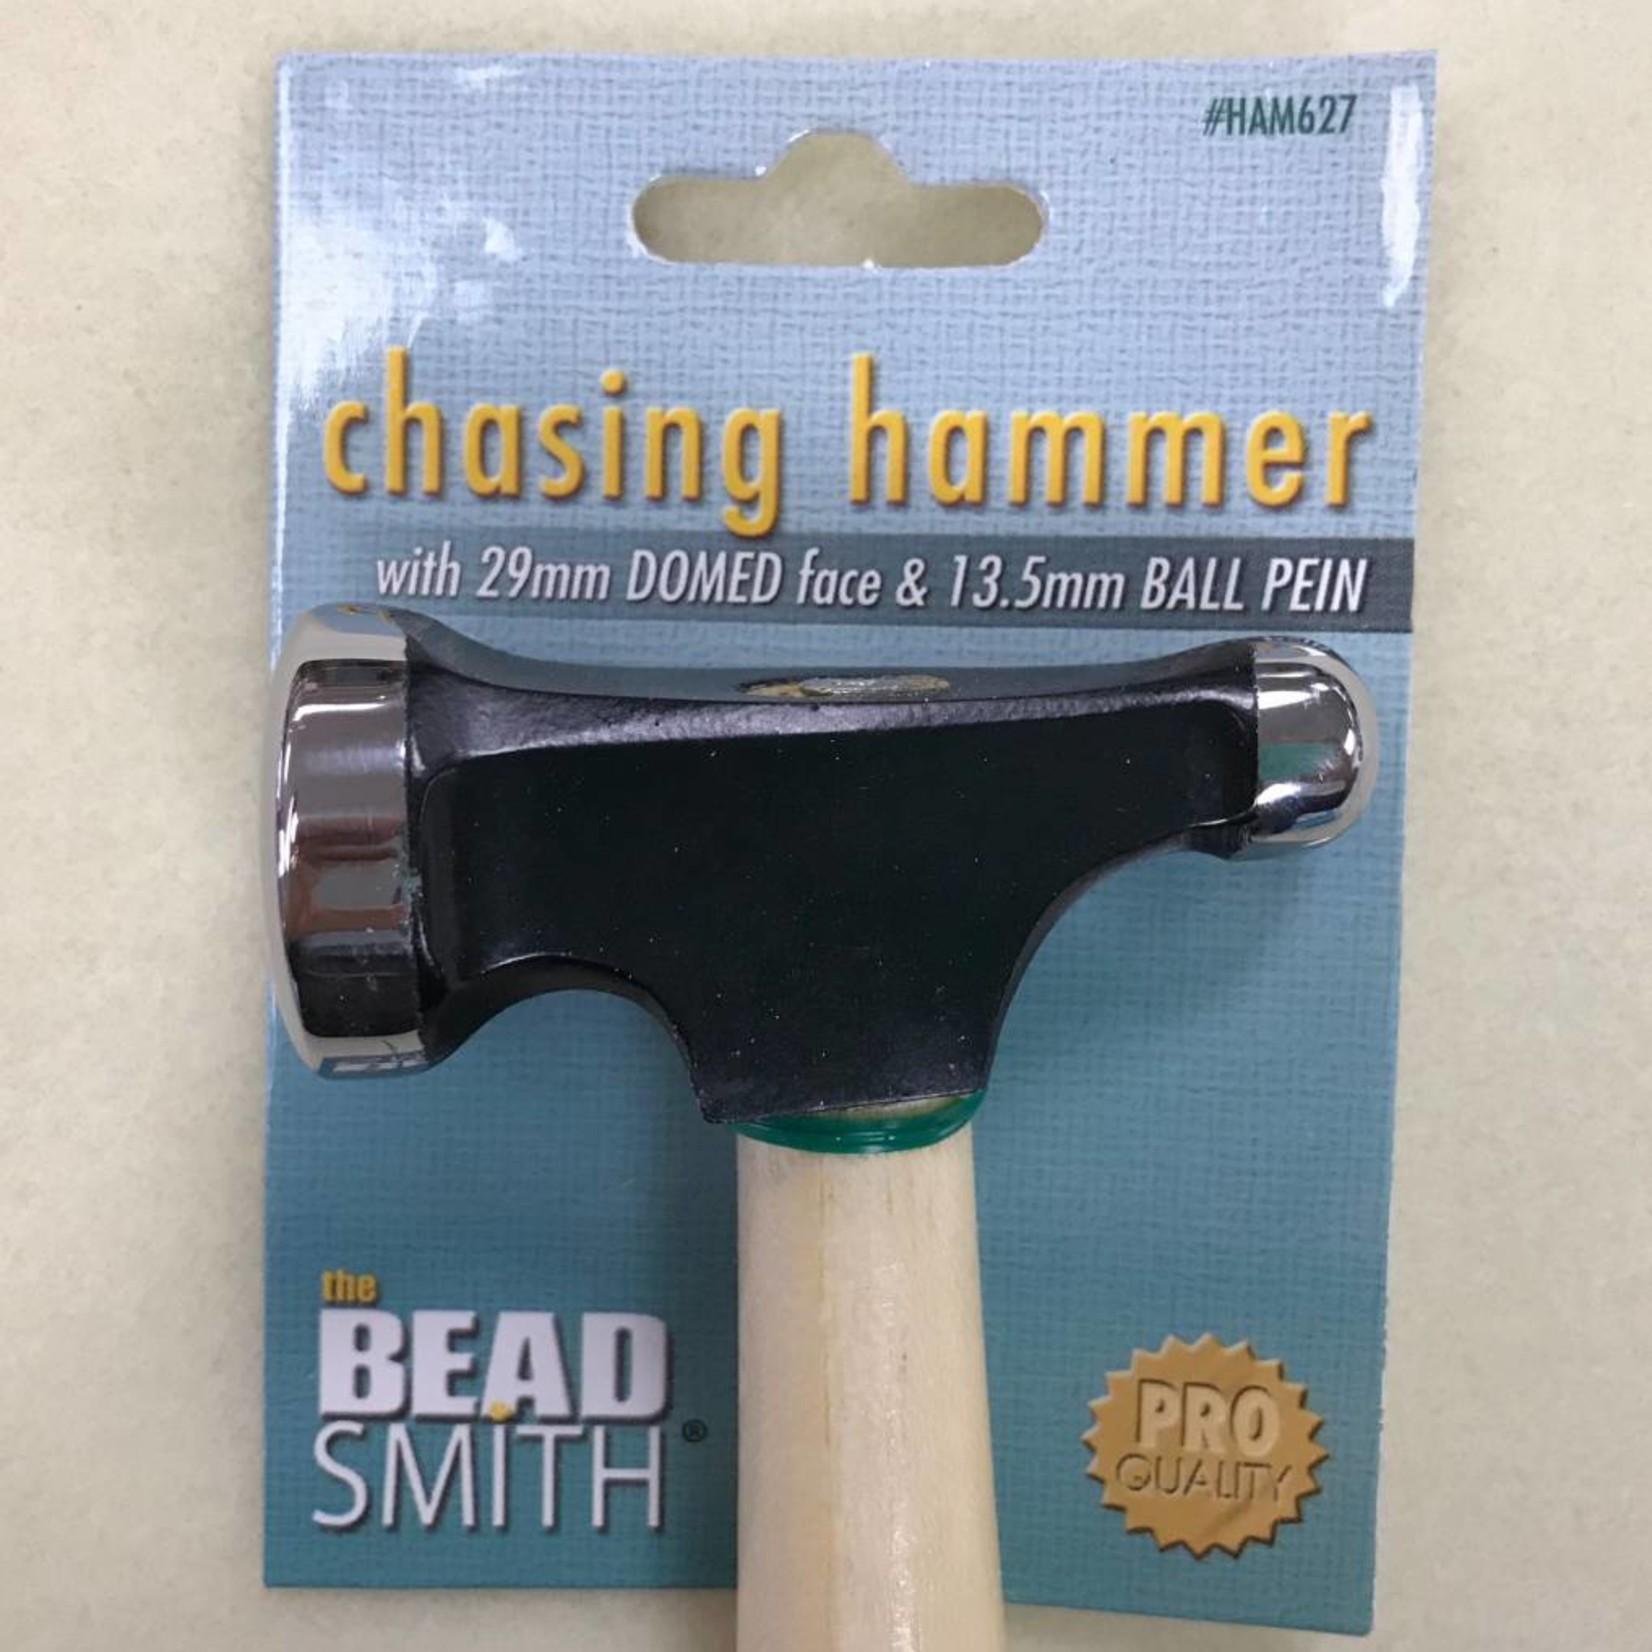 CHASING HAMMER 29mm Dome 13.5mm Ball Peen